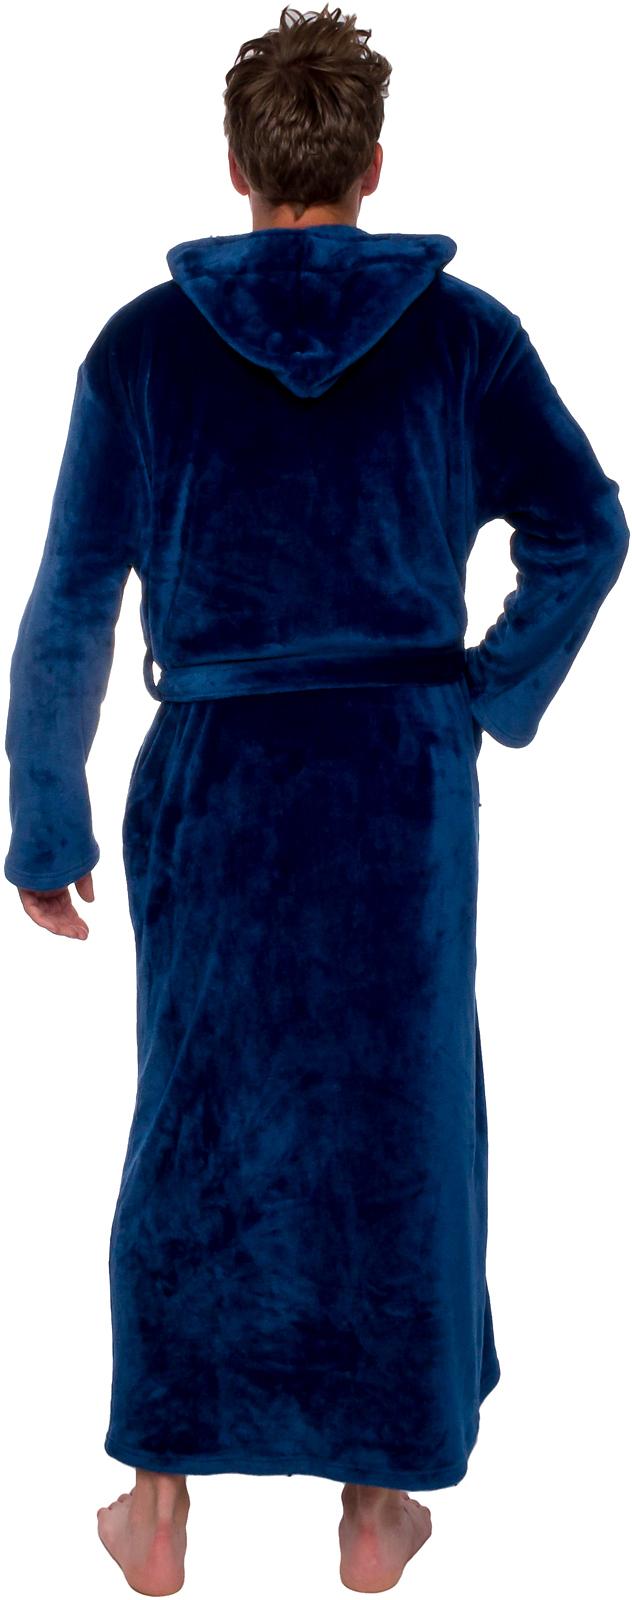 bc189d879a Ross Michaels Mens Hooded Full Length Big and Tall Long Bath Robe